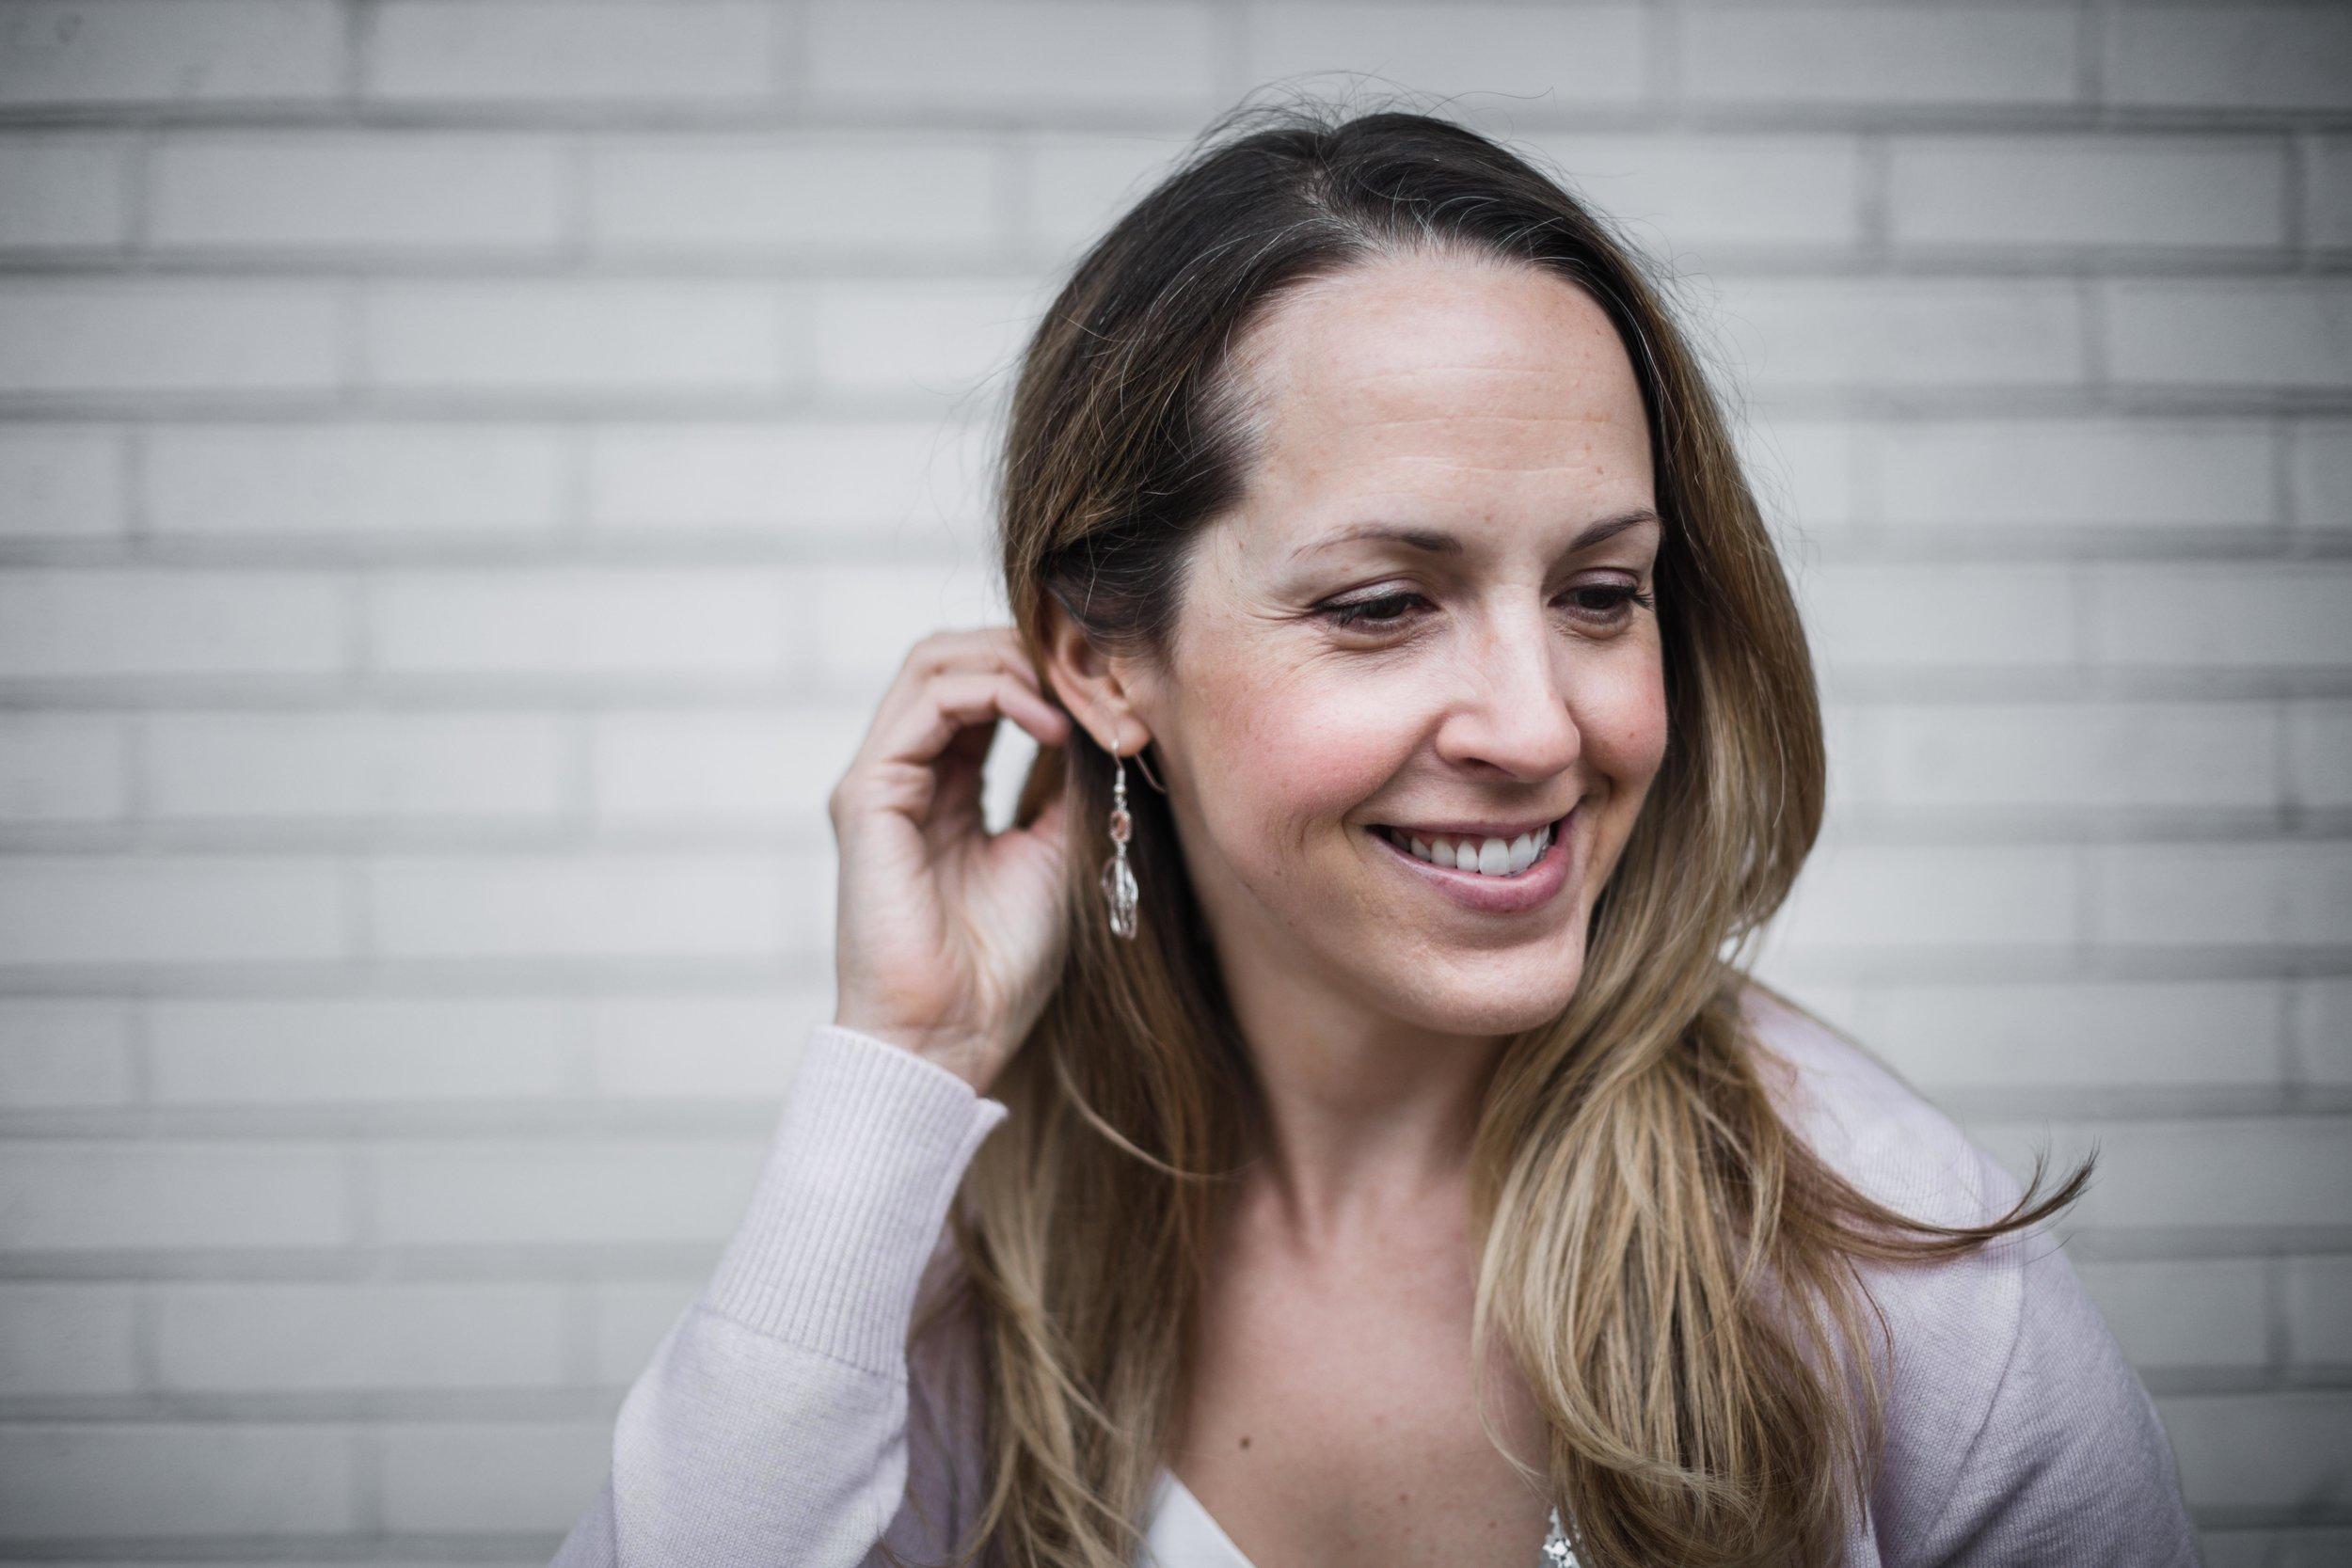 Chicago branding photographer Katharine Hannah interviews local jewelry designer grace + hudson